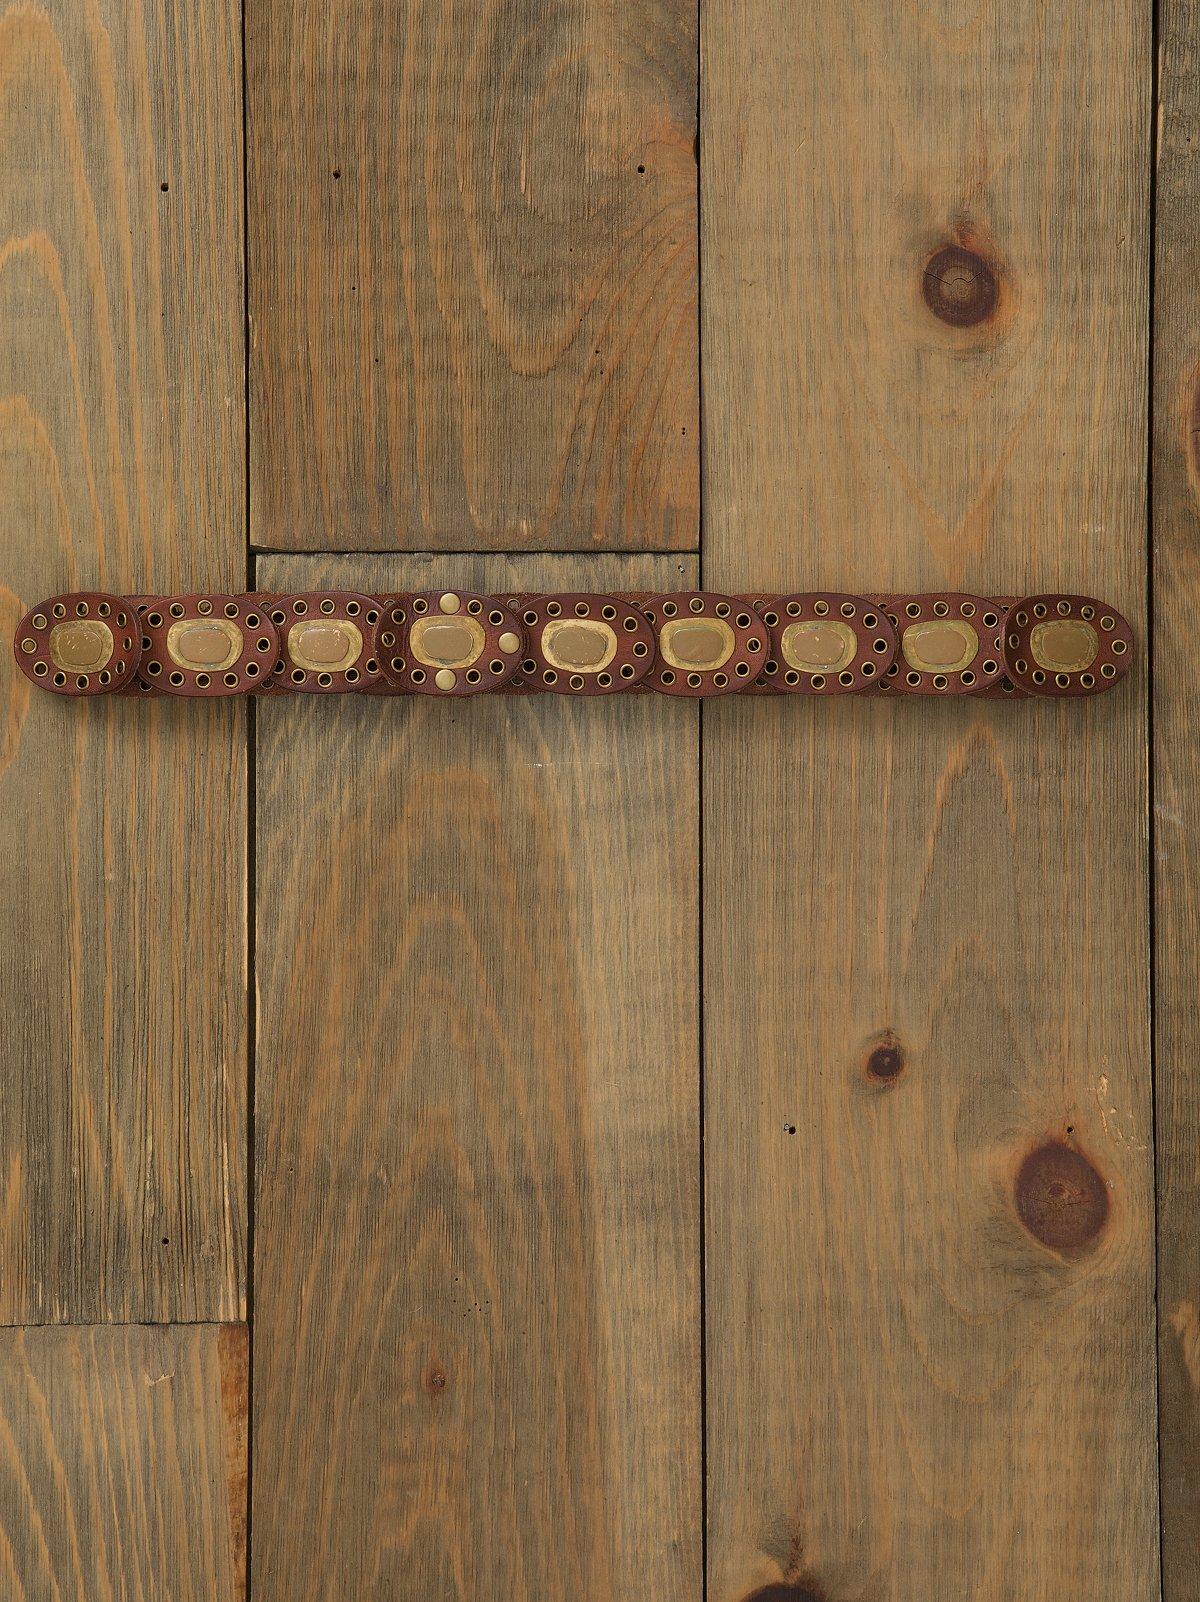 Forenza Waist Belt